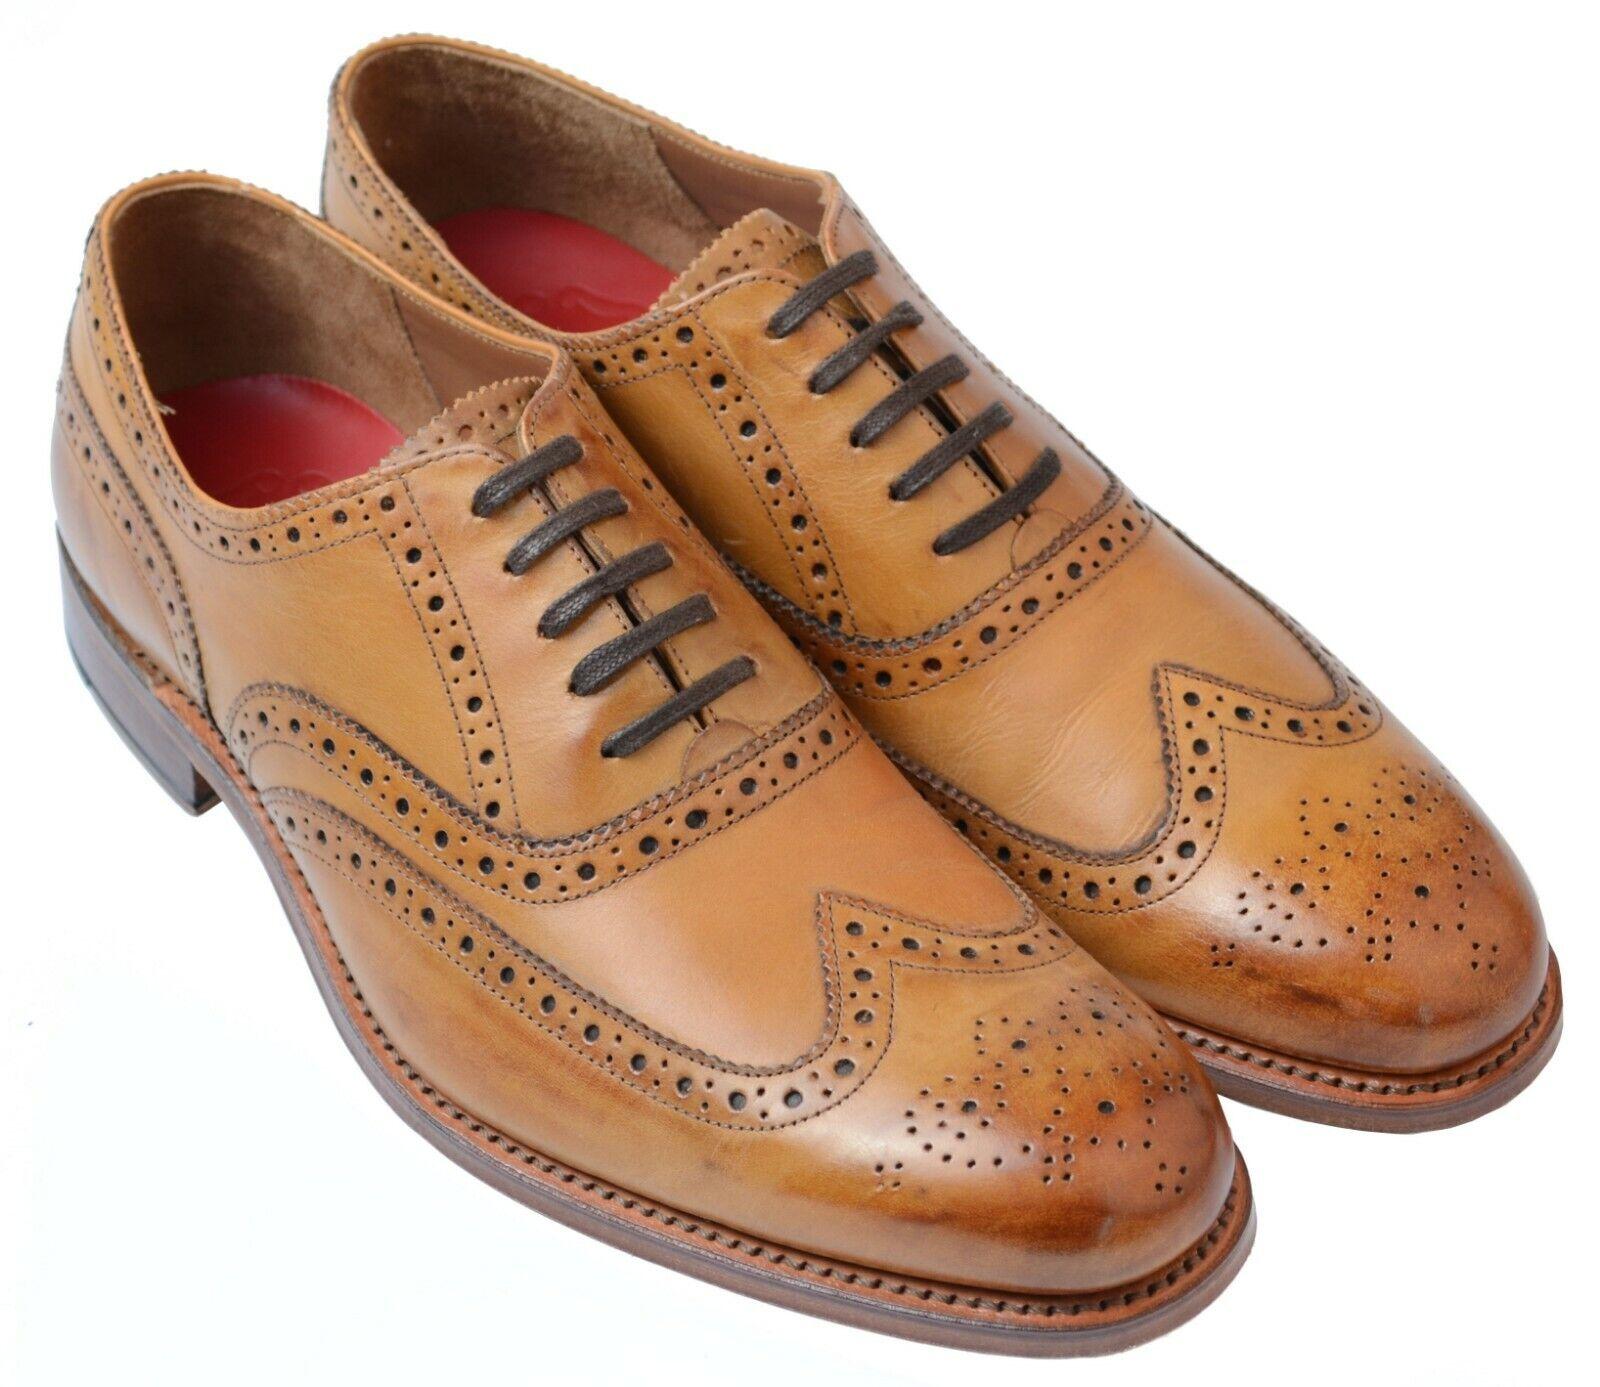 Gentleman's Classic Wing Tip Oxford Brogue Grenson Dylan tan UK Talla 8.5 F Ajuste